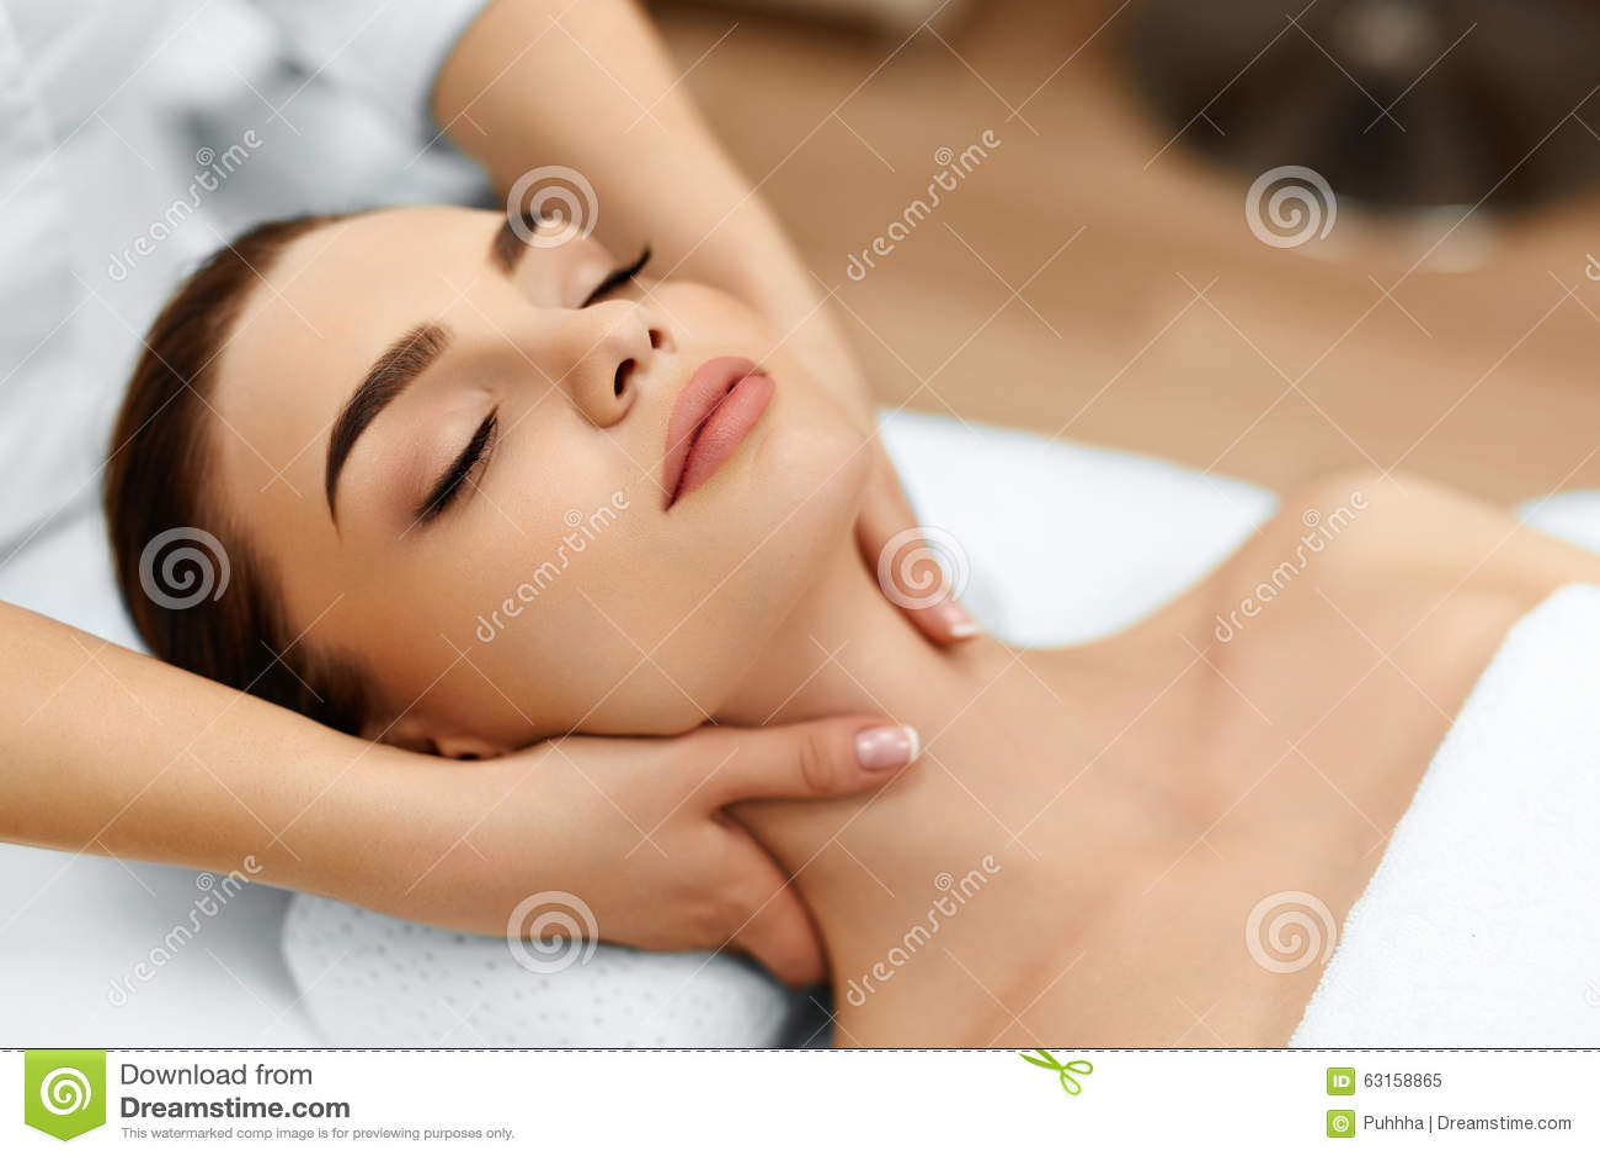 Huid, Lichaamsverzorging Woman Getting Beauty Spa Gezichtsmassage Treatmen